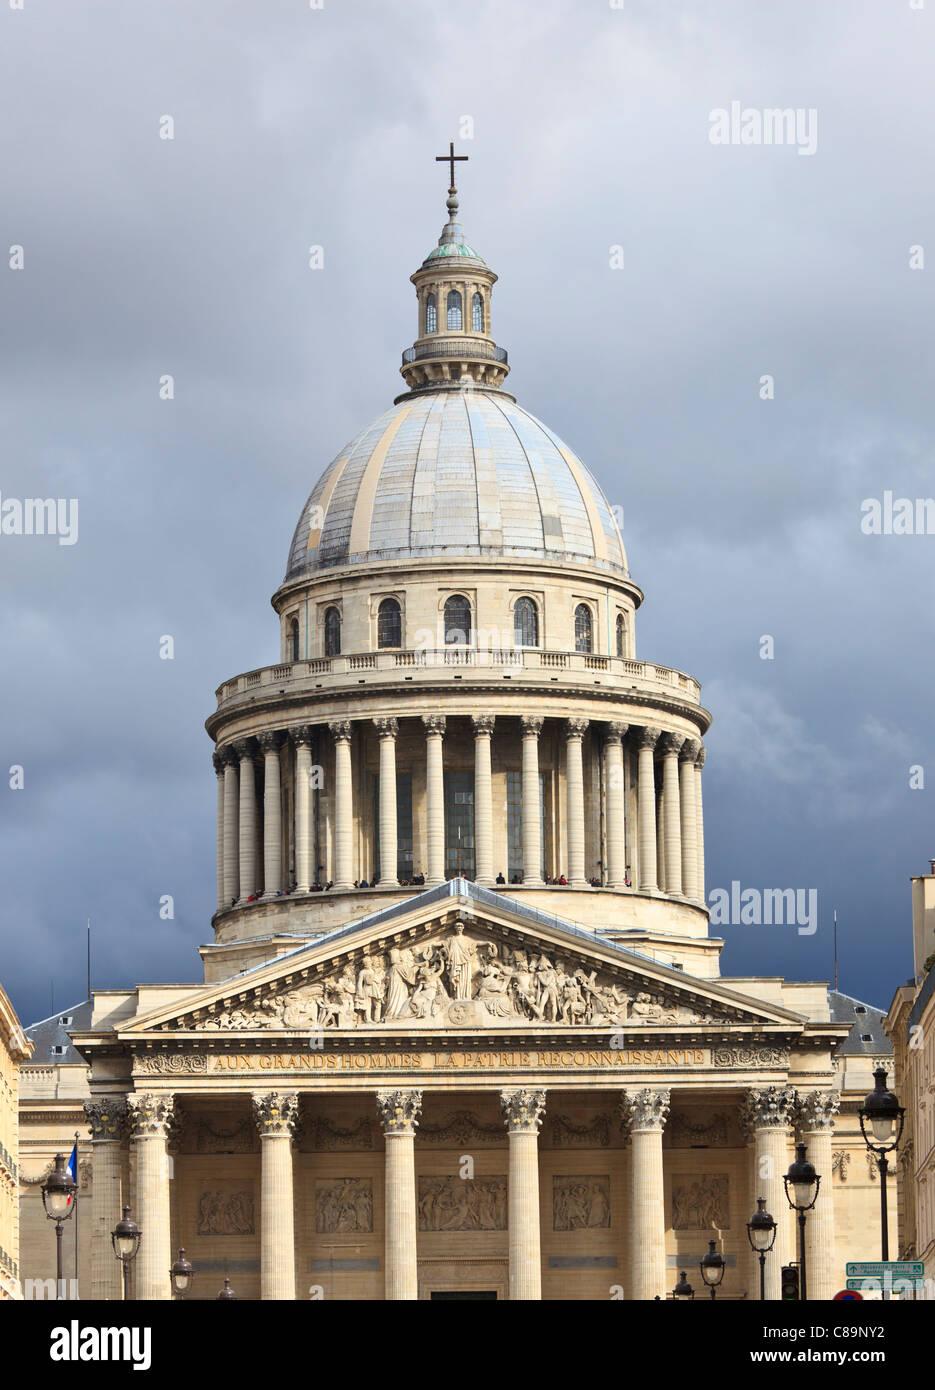 Teleshot of a fragment of Pantheon, famous parisian sightseeing - Stock Image